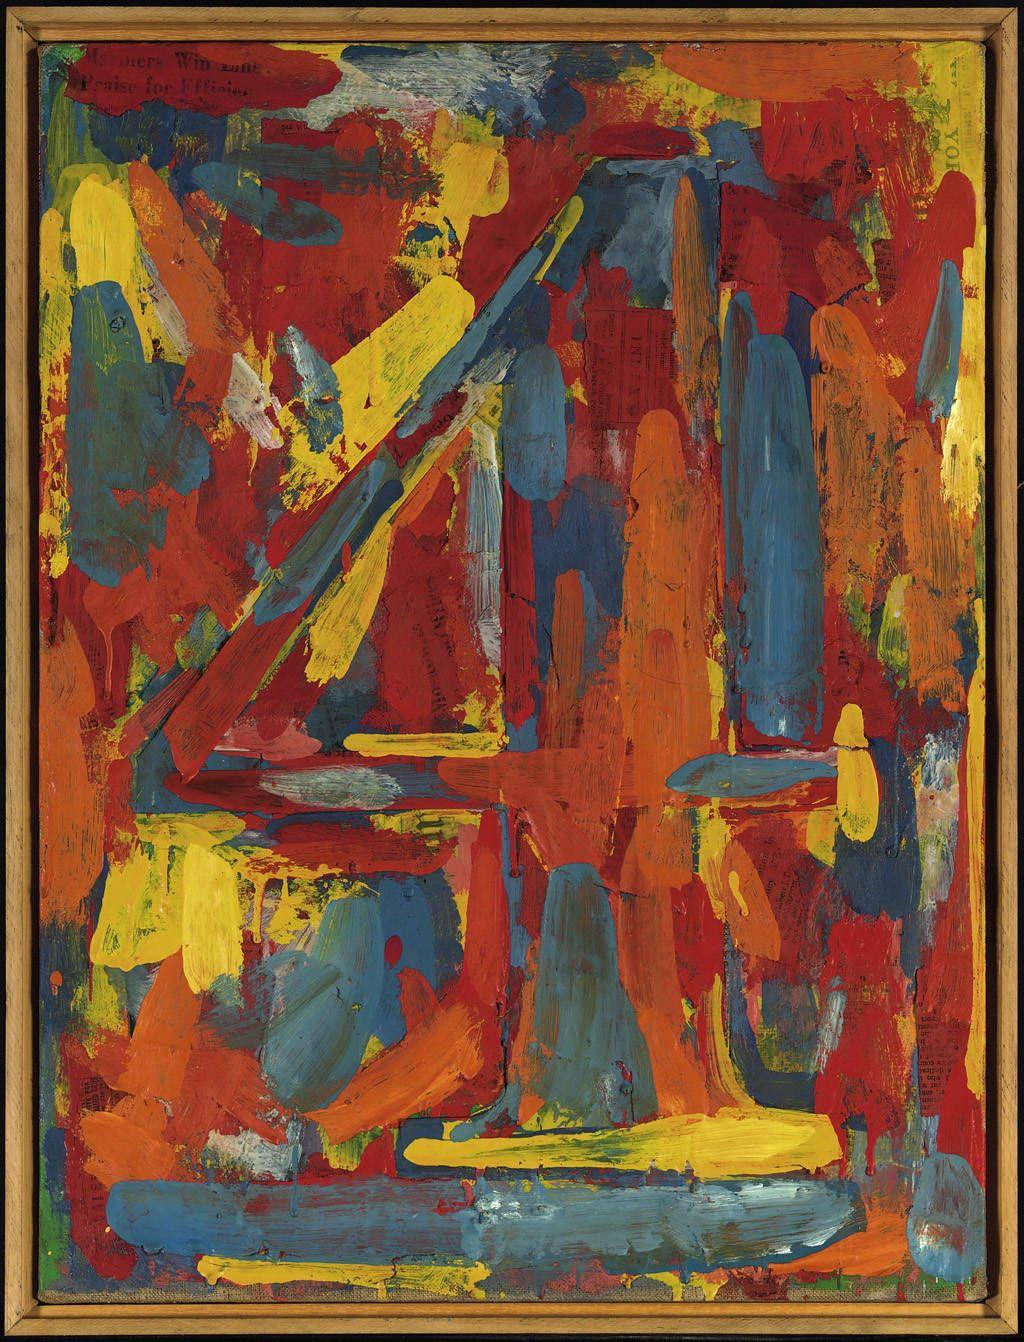 Jasper johns visual arts pinterest for John s painting